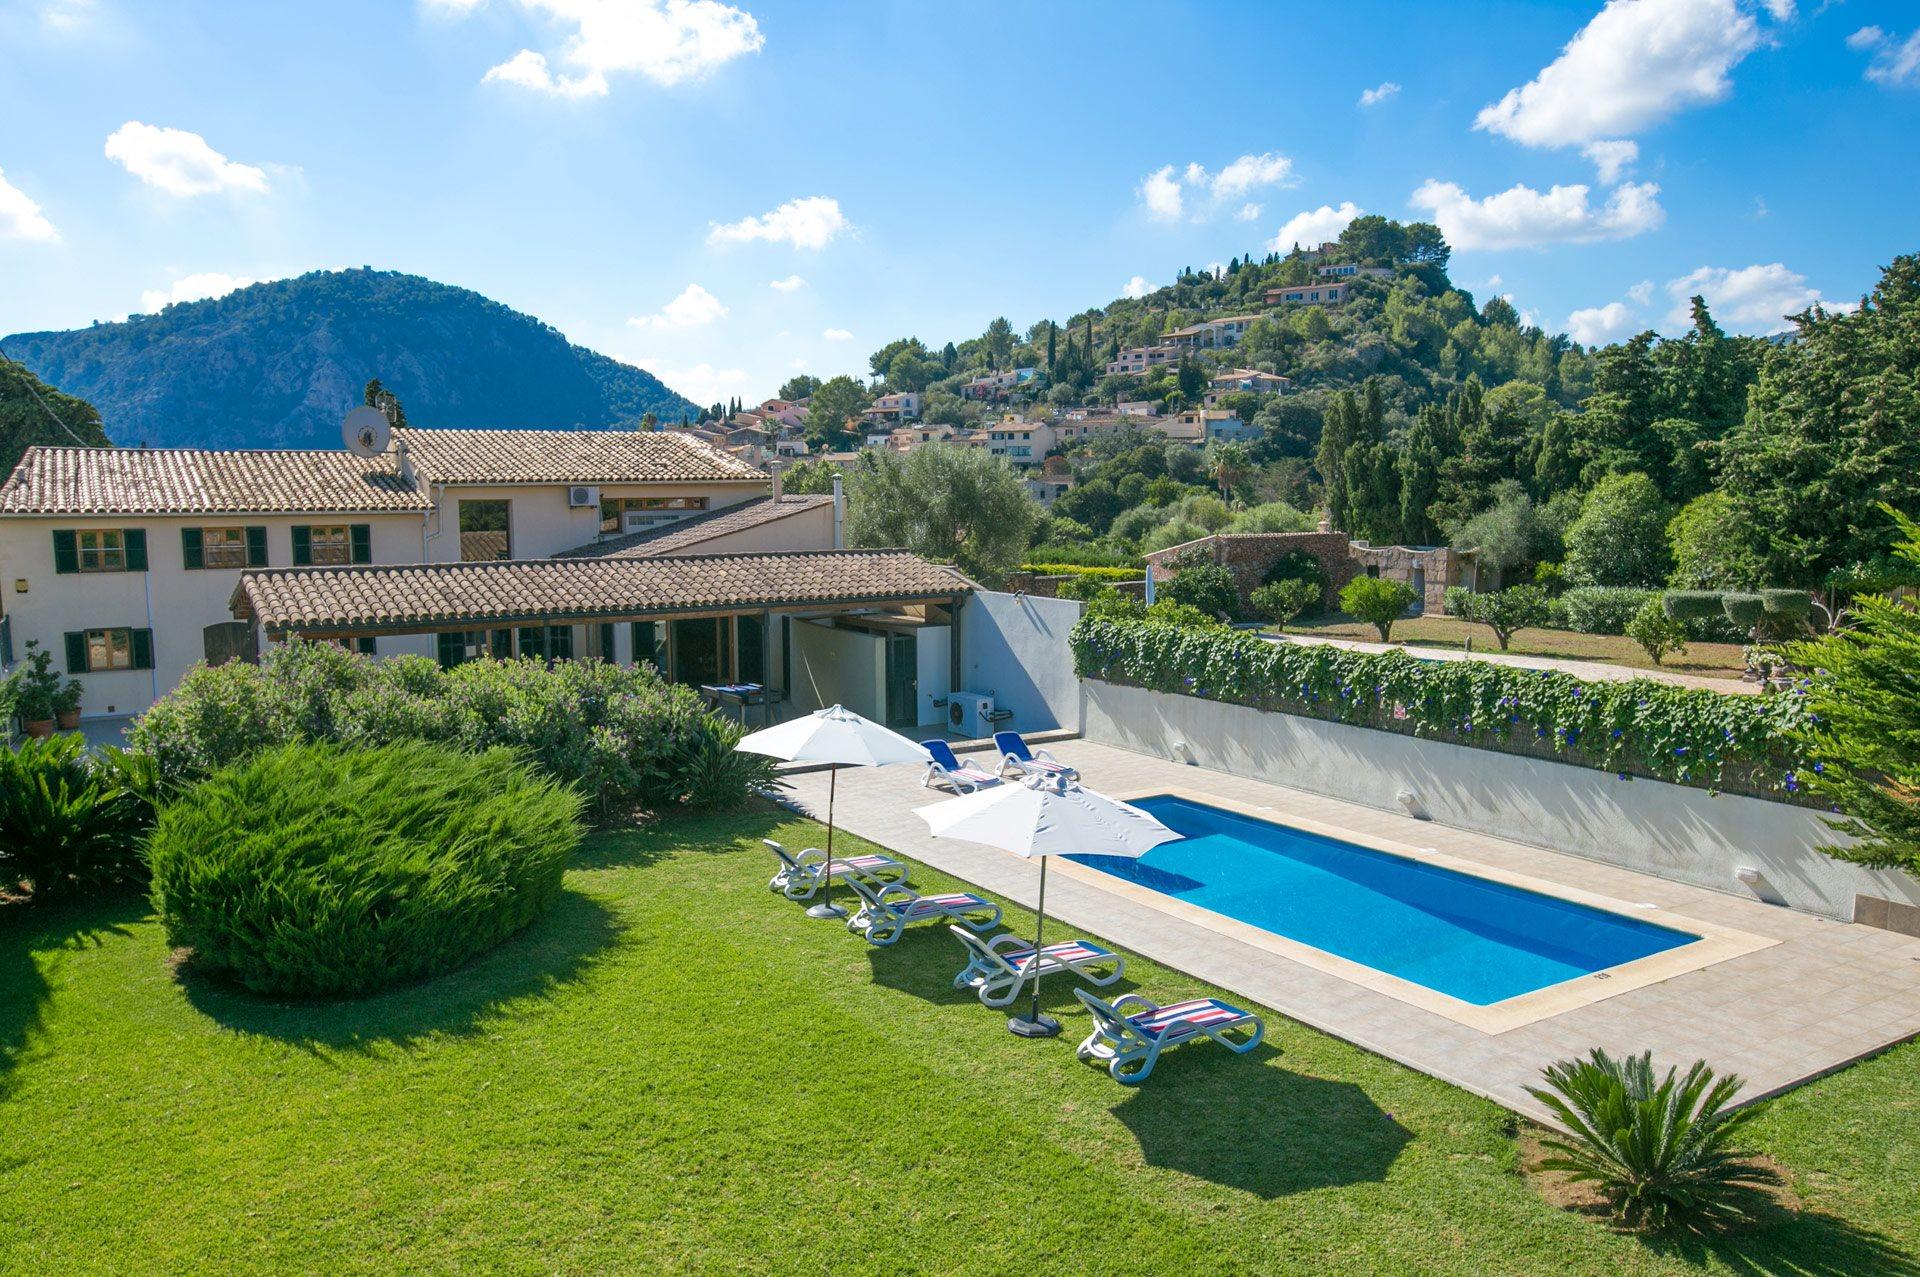 Villa Llobiner, Pollensa, Majorca, Spain